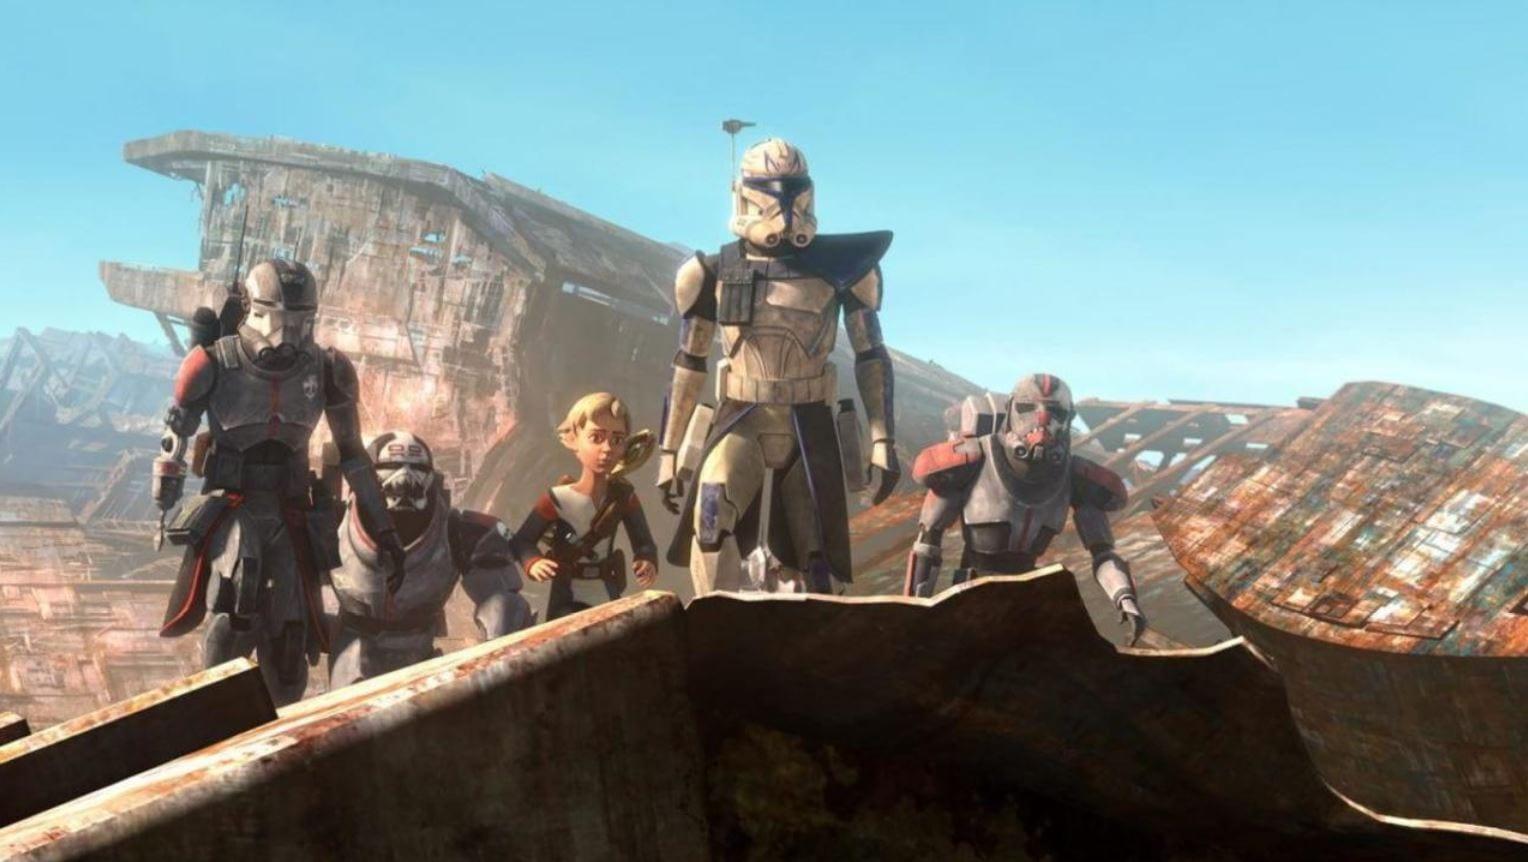 Bracca in the Bad Batch: Connection to Star Wars Jedi: Fallen Order